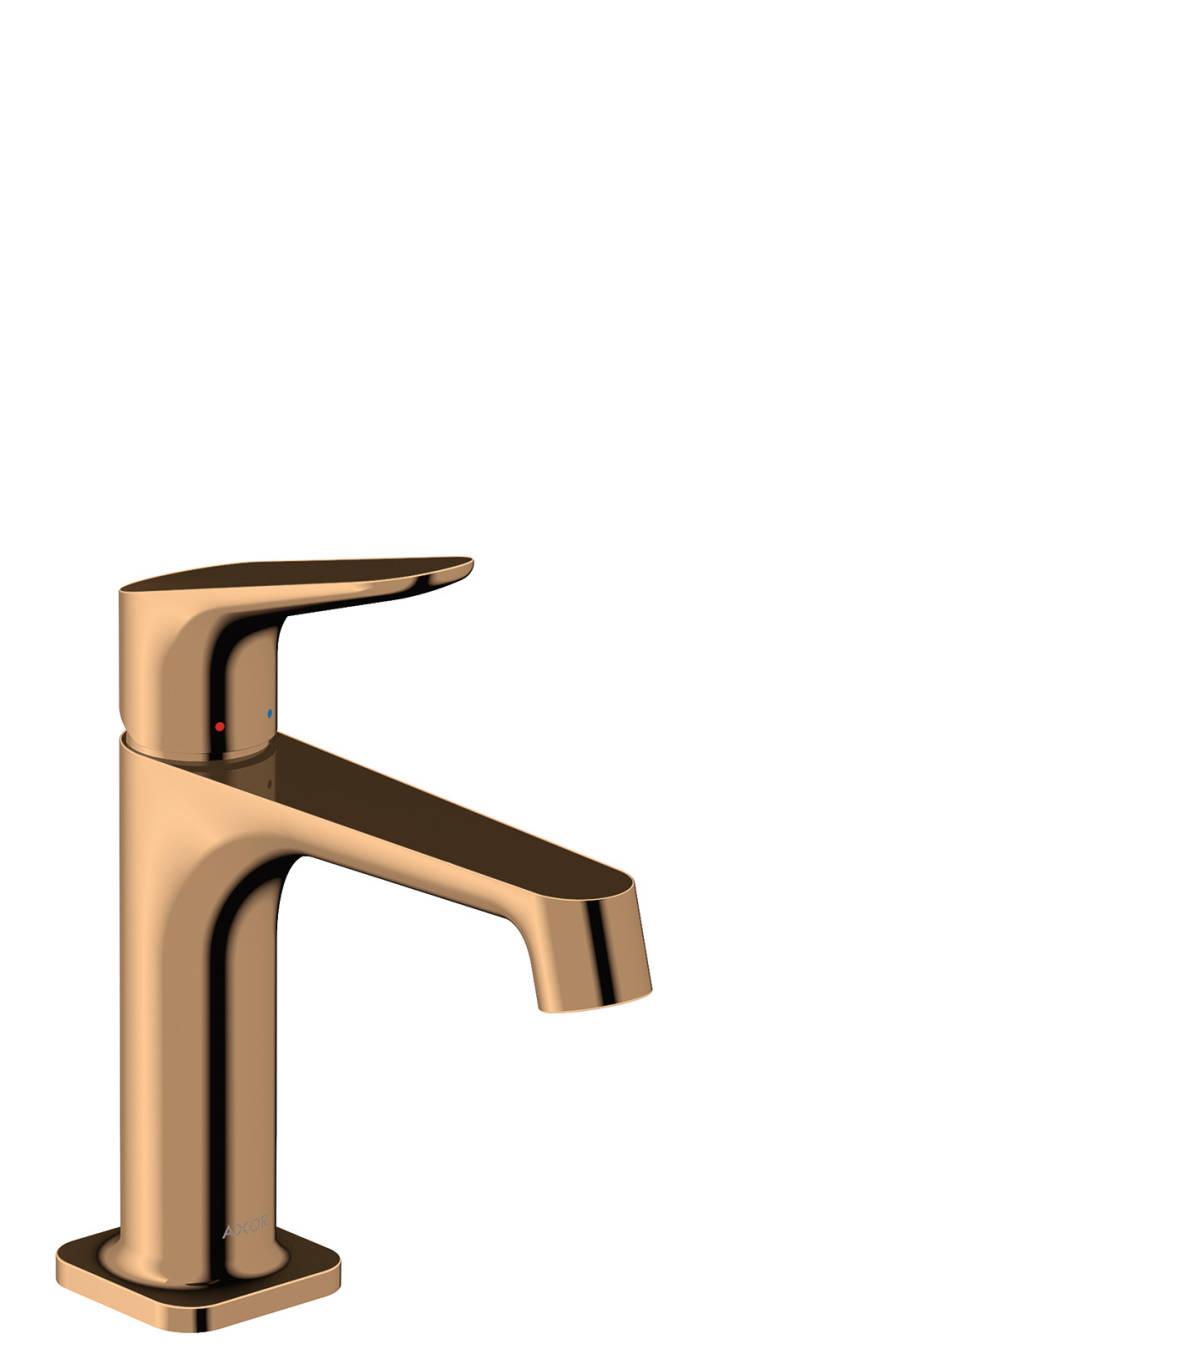 Single lever basin mixer 100 with pop-up waste set, Polished Bronze, 34010130